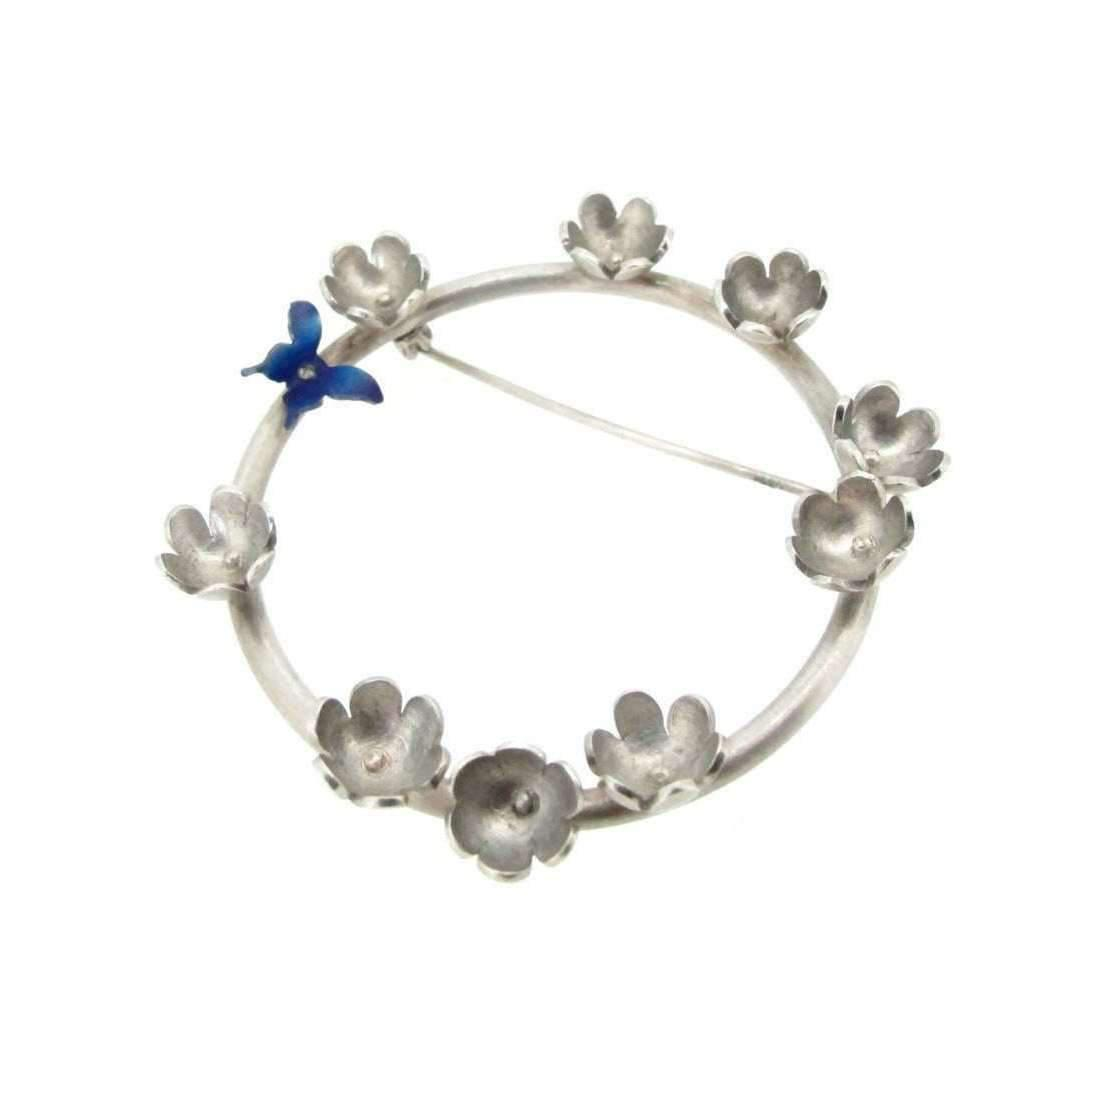 Sian Bostwick Jewellery Butterfly & Daisy Circlet Brooch qFeX2nhx